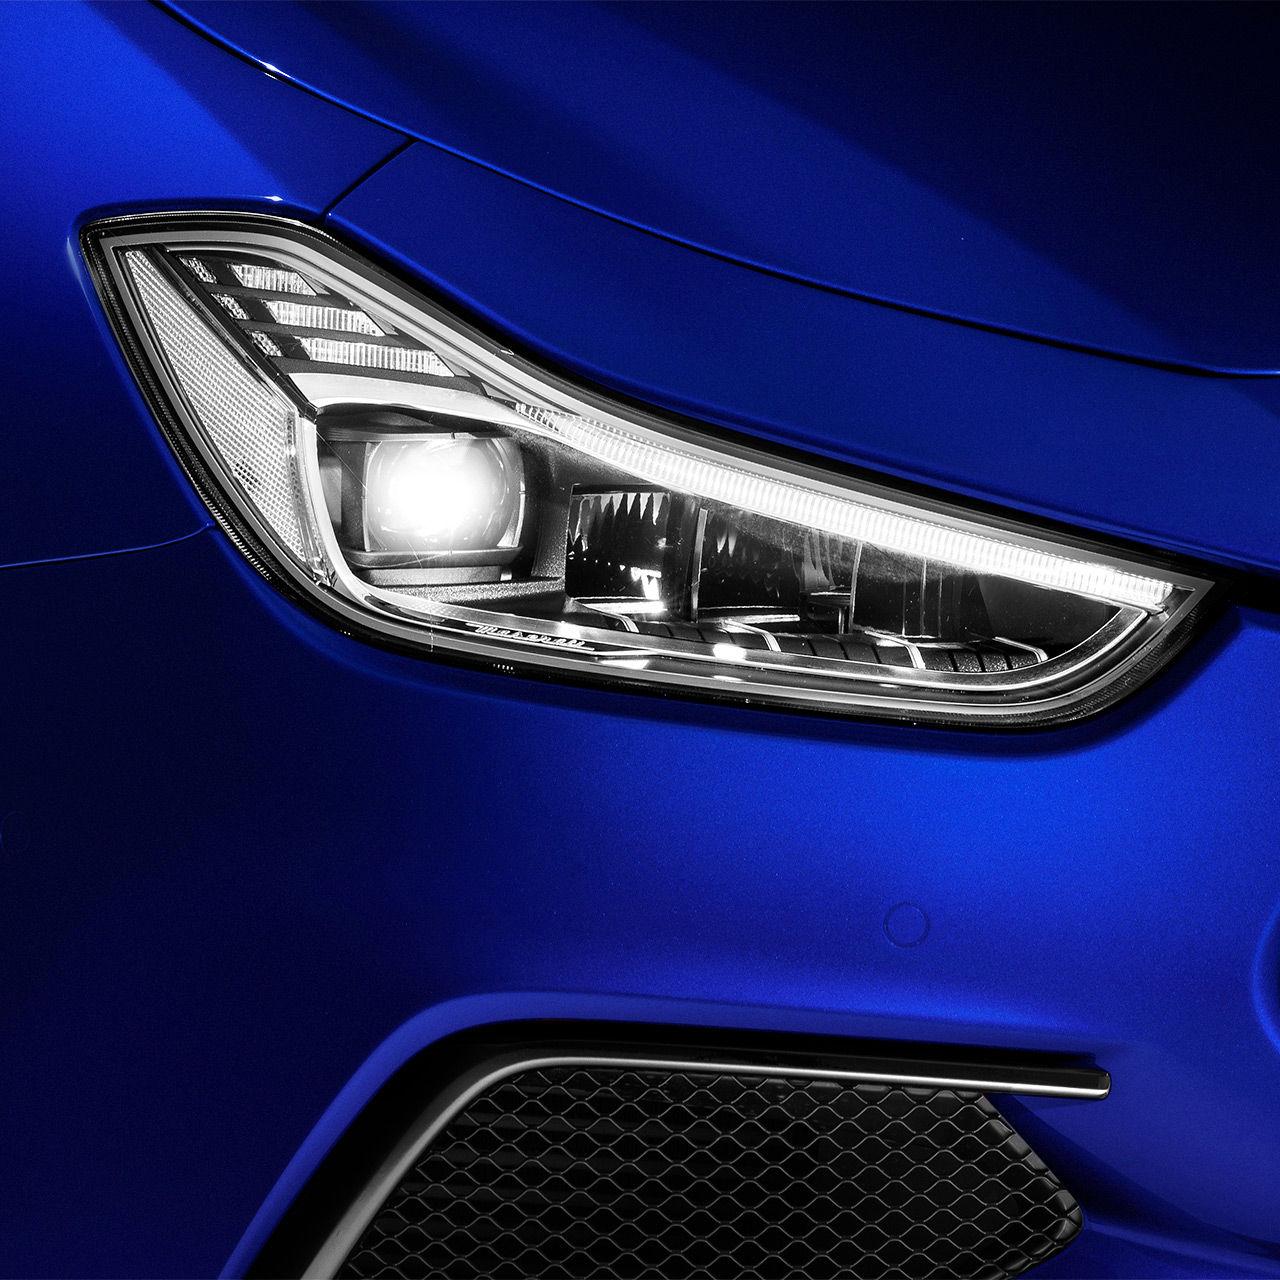 Maserati Ghibli SQ4 - Blau - Kühlergrill und Scheinwerfer